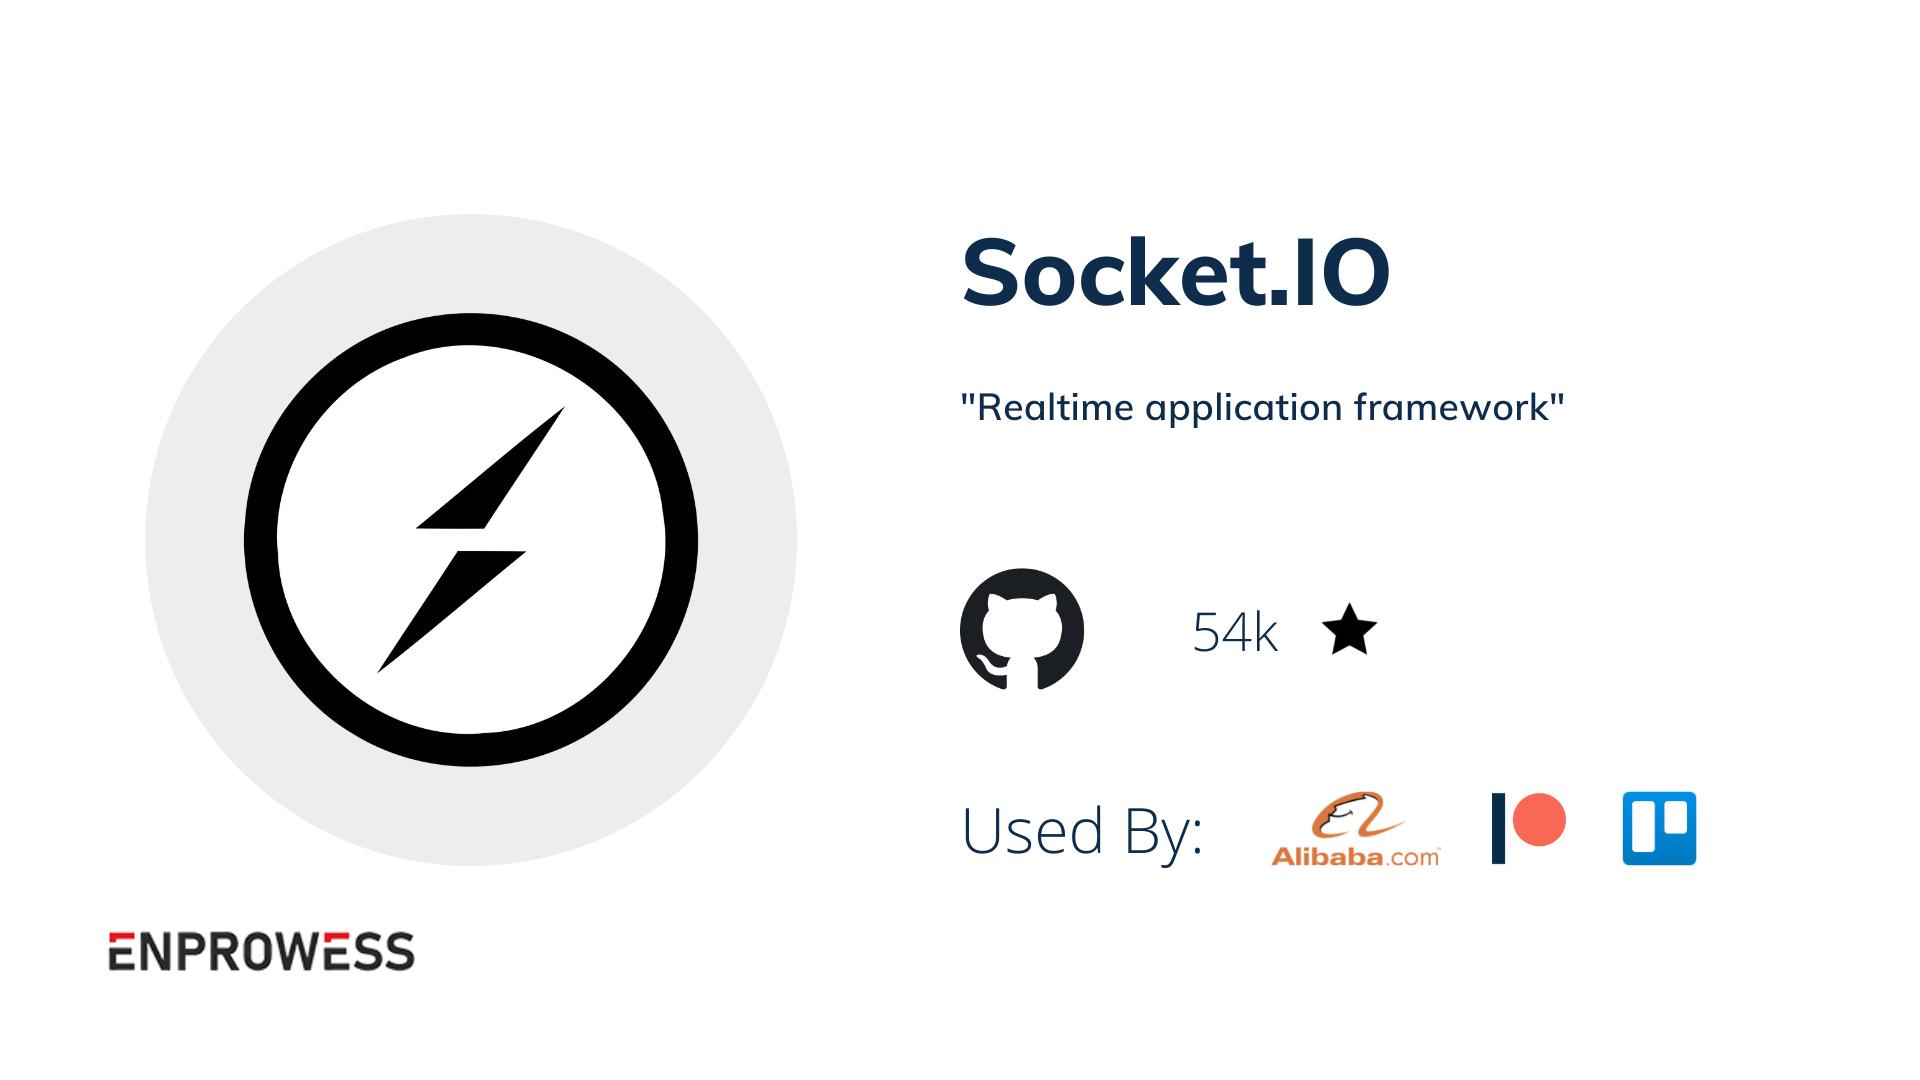 Socket.io details